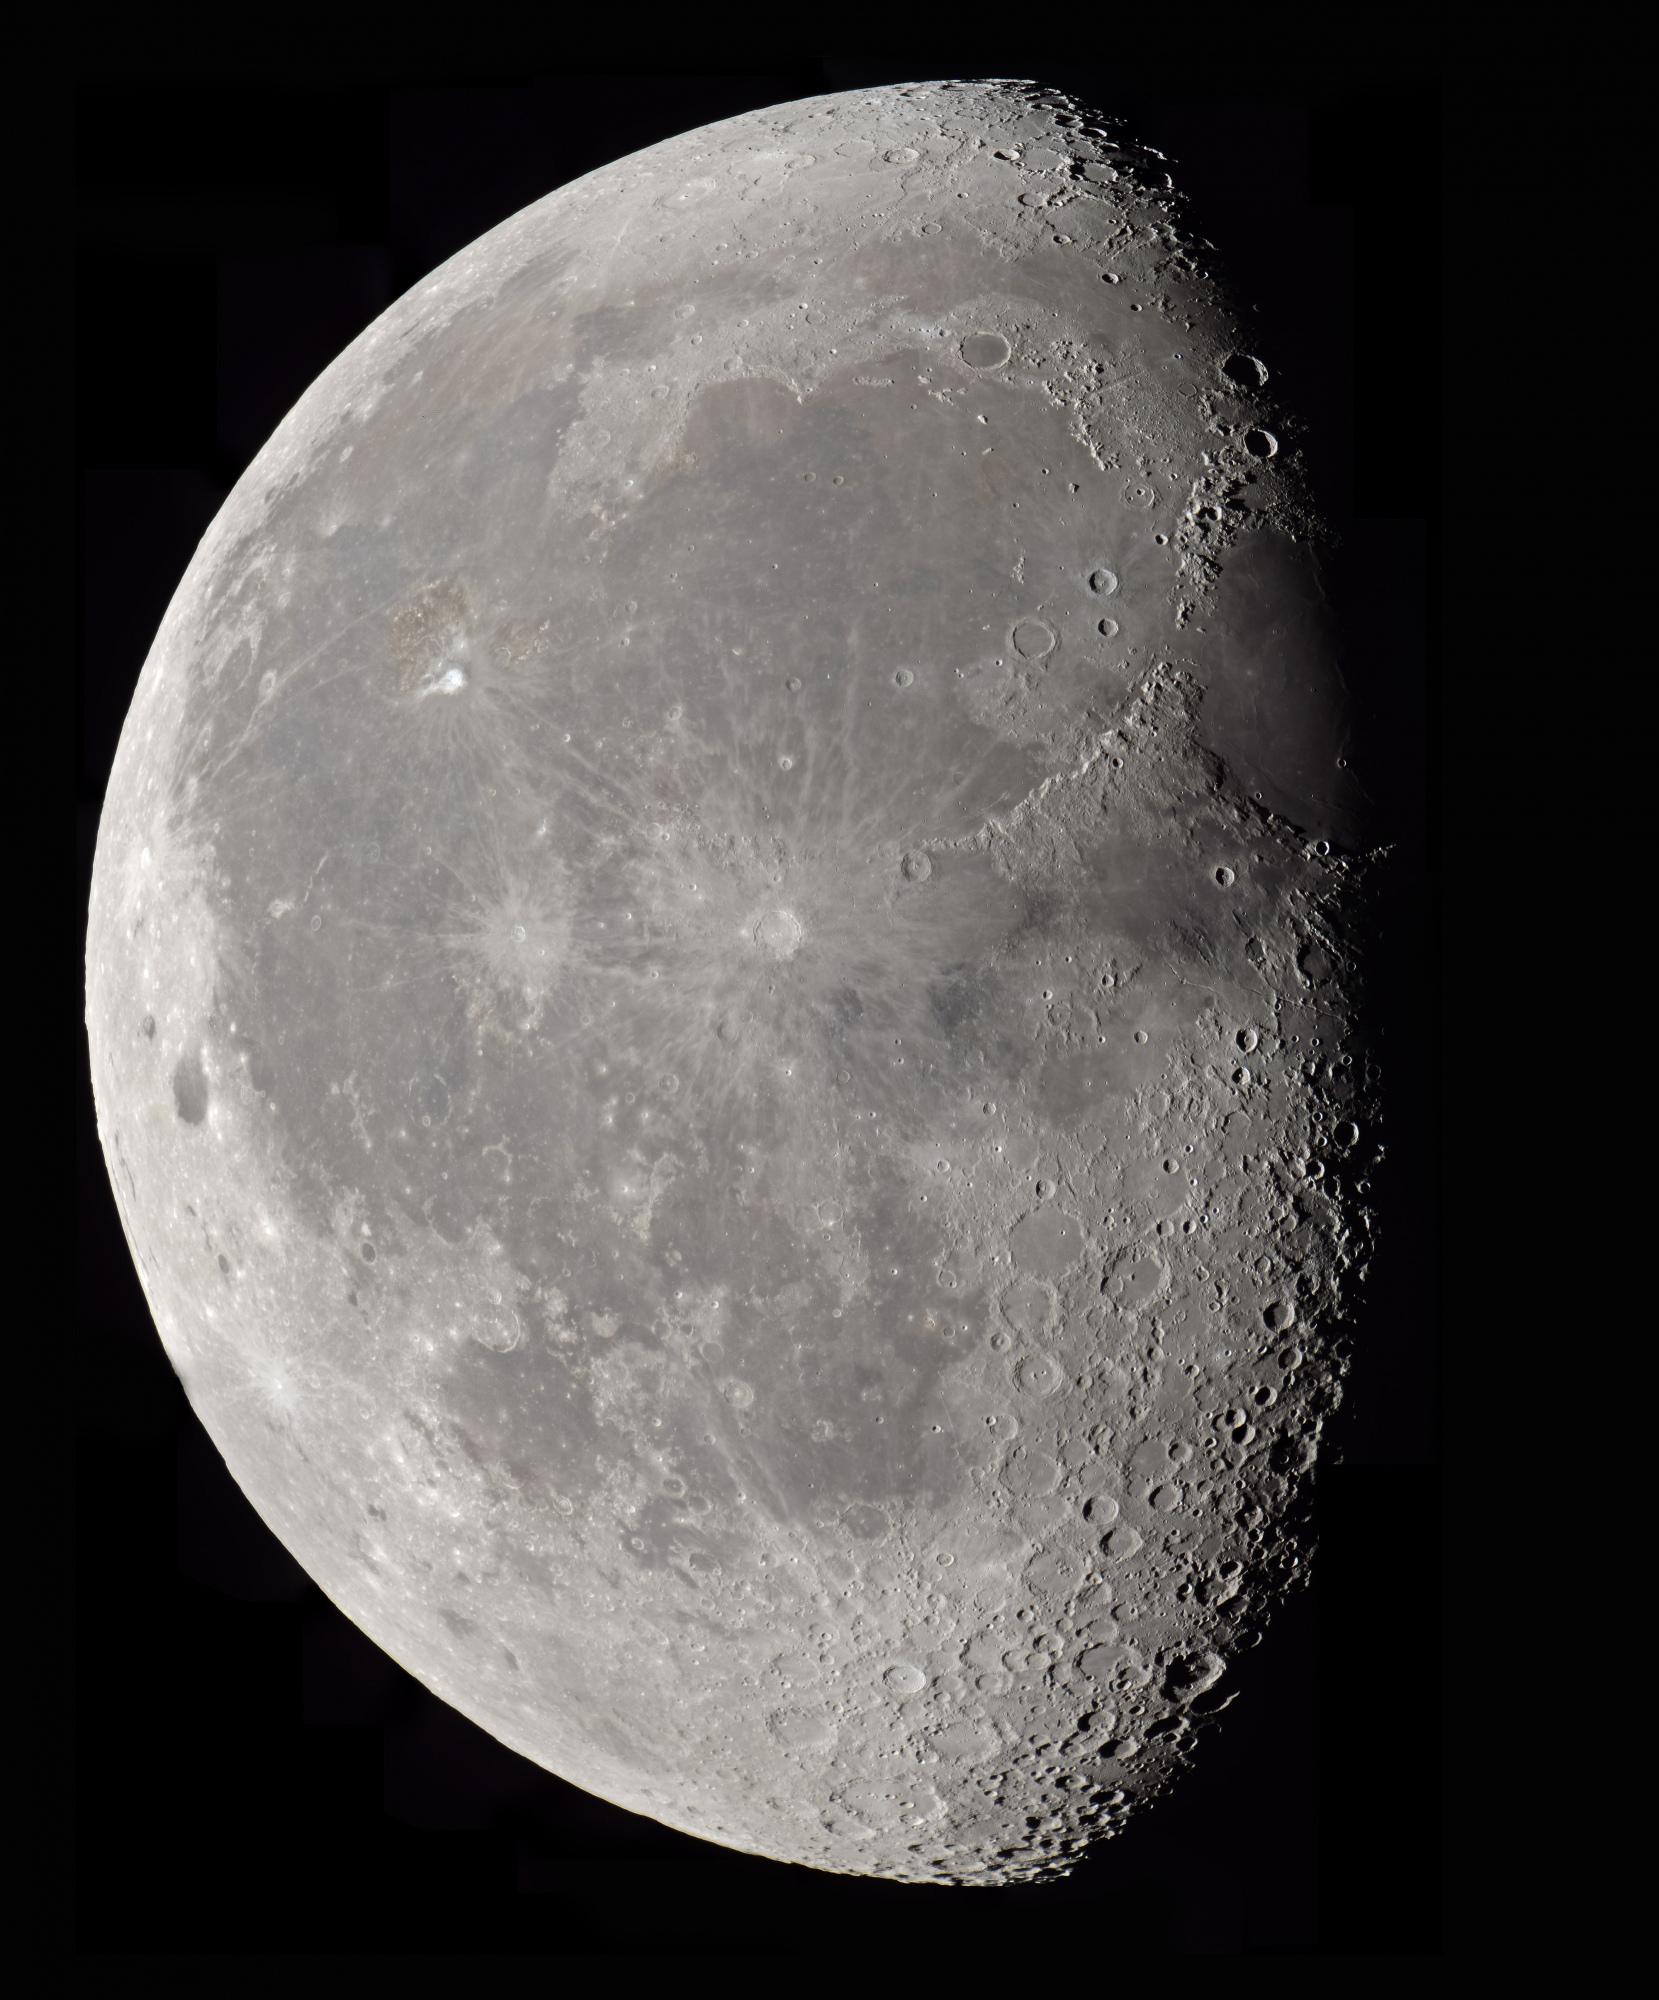 Lune 01 sept 2018 Astrouf.jpg